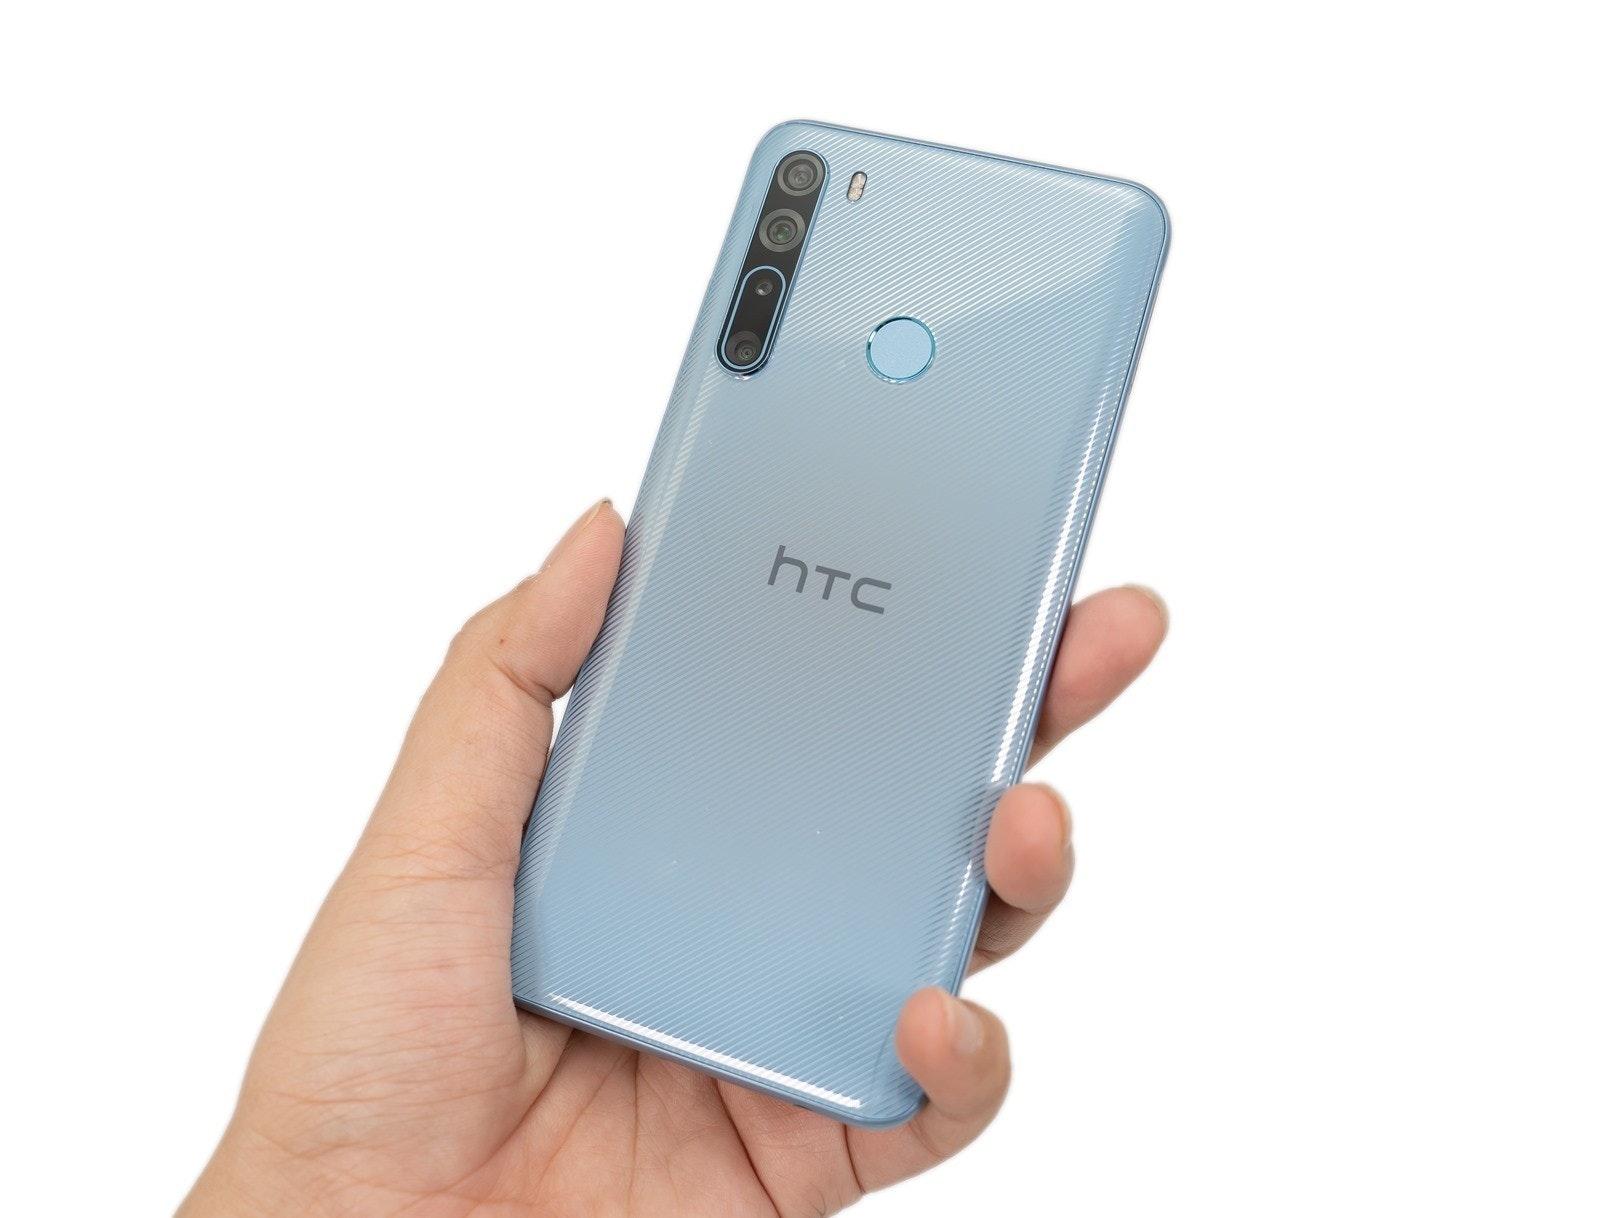 HTC 中阶新机Desire 20 Pro 性能、电力续航与游戏实测✡